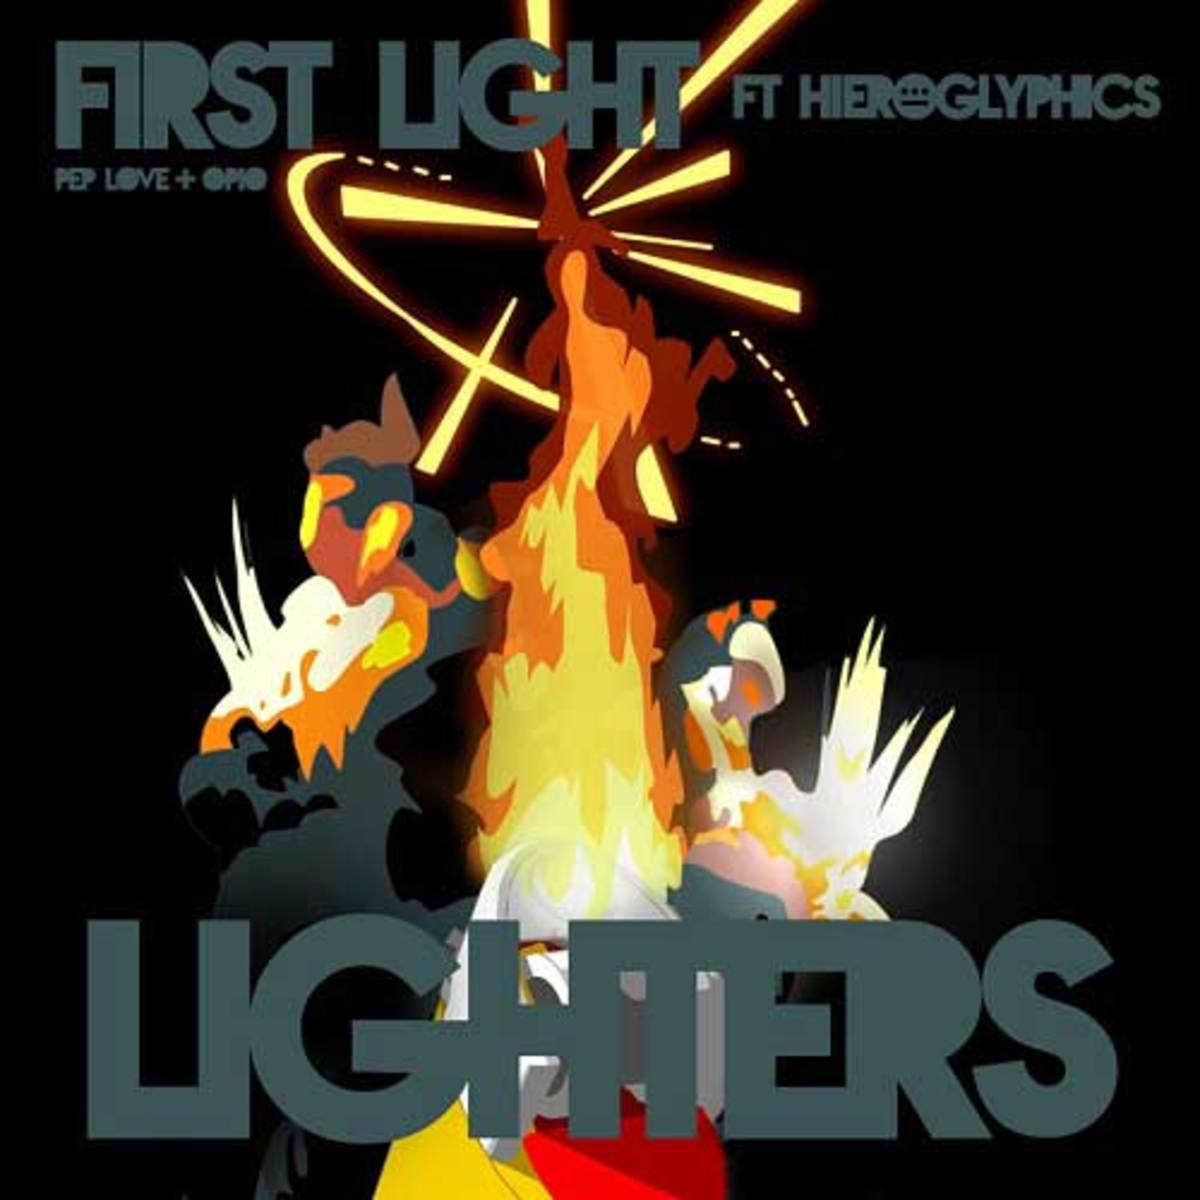 firstlight-lighters.jpg